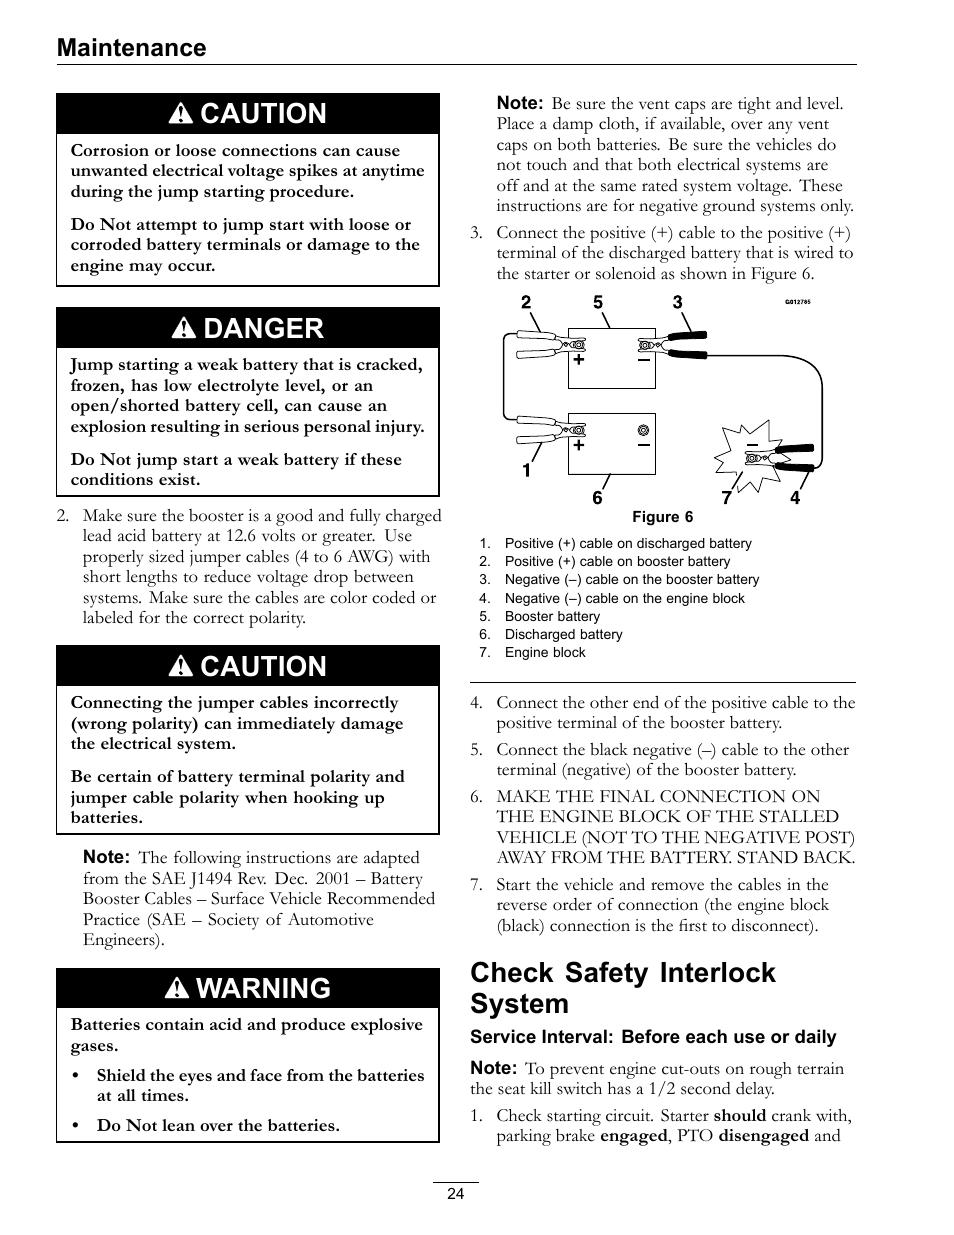 check safety interlock system caution danger exmark navigator 0 rh manualsdir com Exmark Navigator Hopper Exmark Navigator Hopper